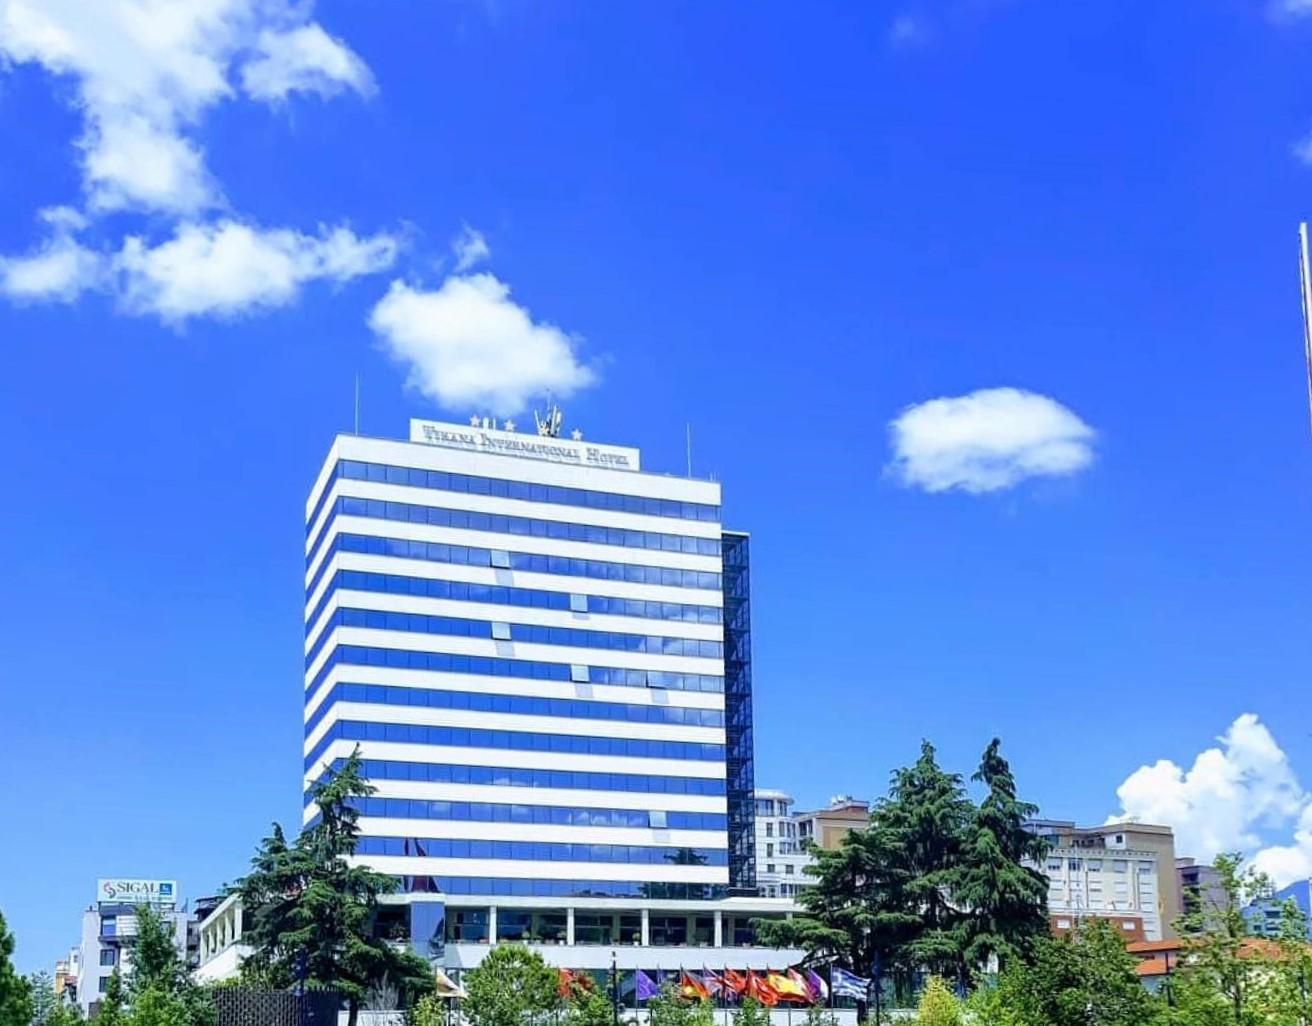 Tirana International Hotel And Conference Center